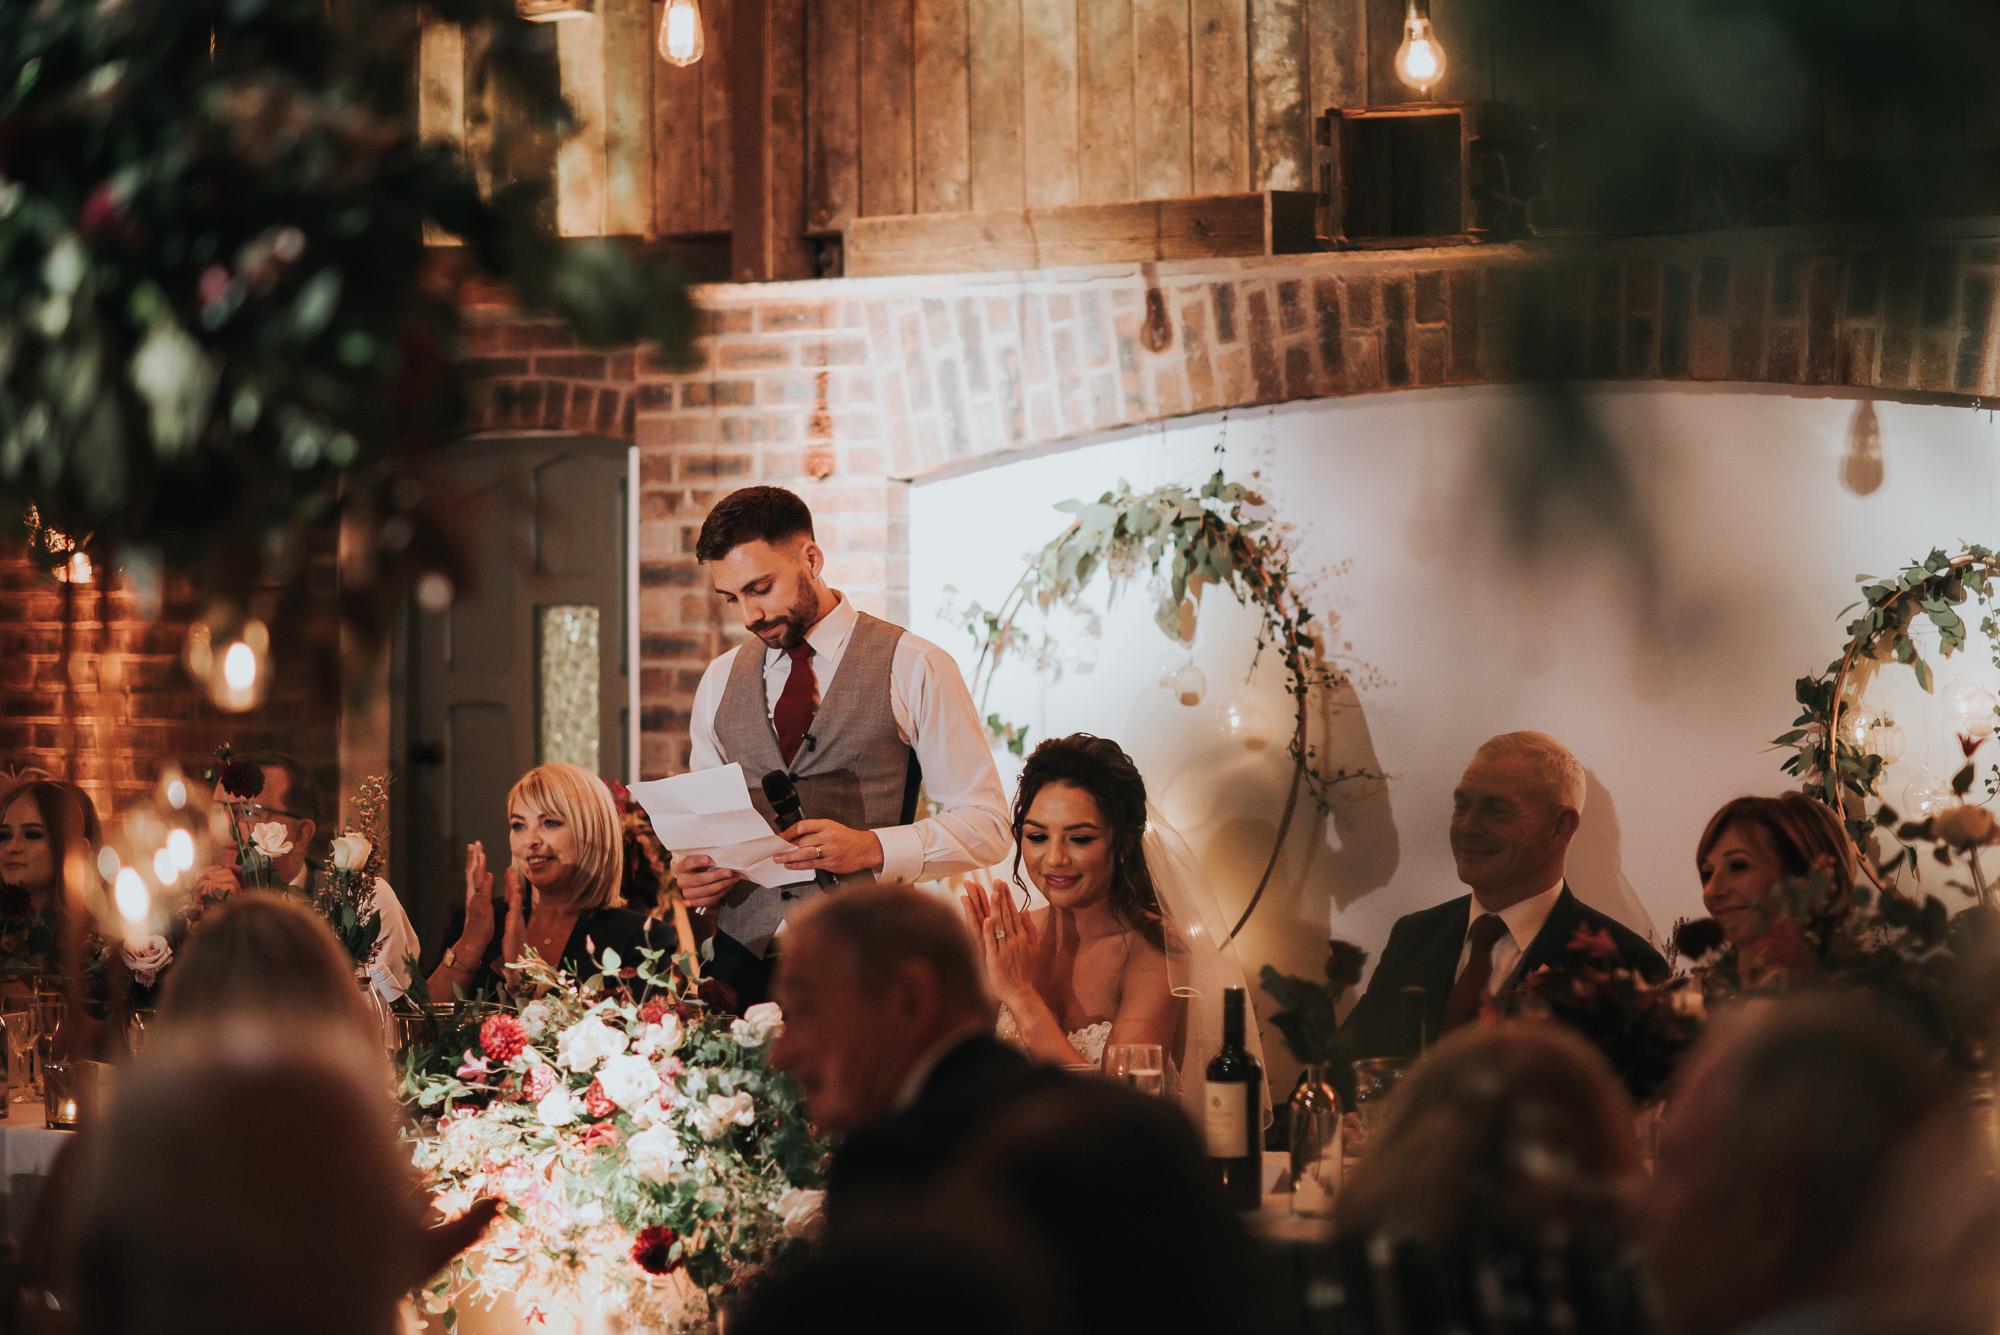 Owen house wedding barn wedding photographer north west cheshire england (4 of 10).jpg